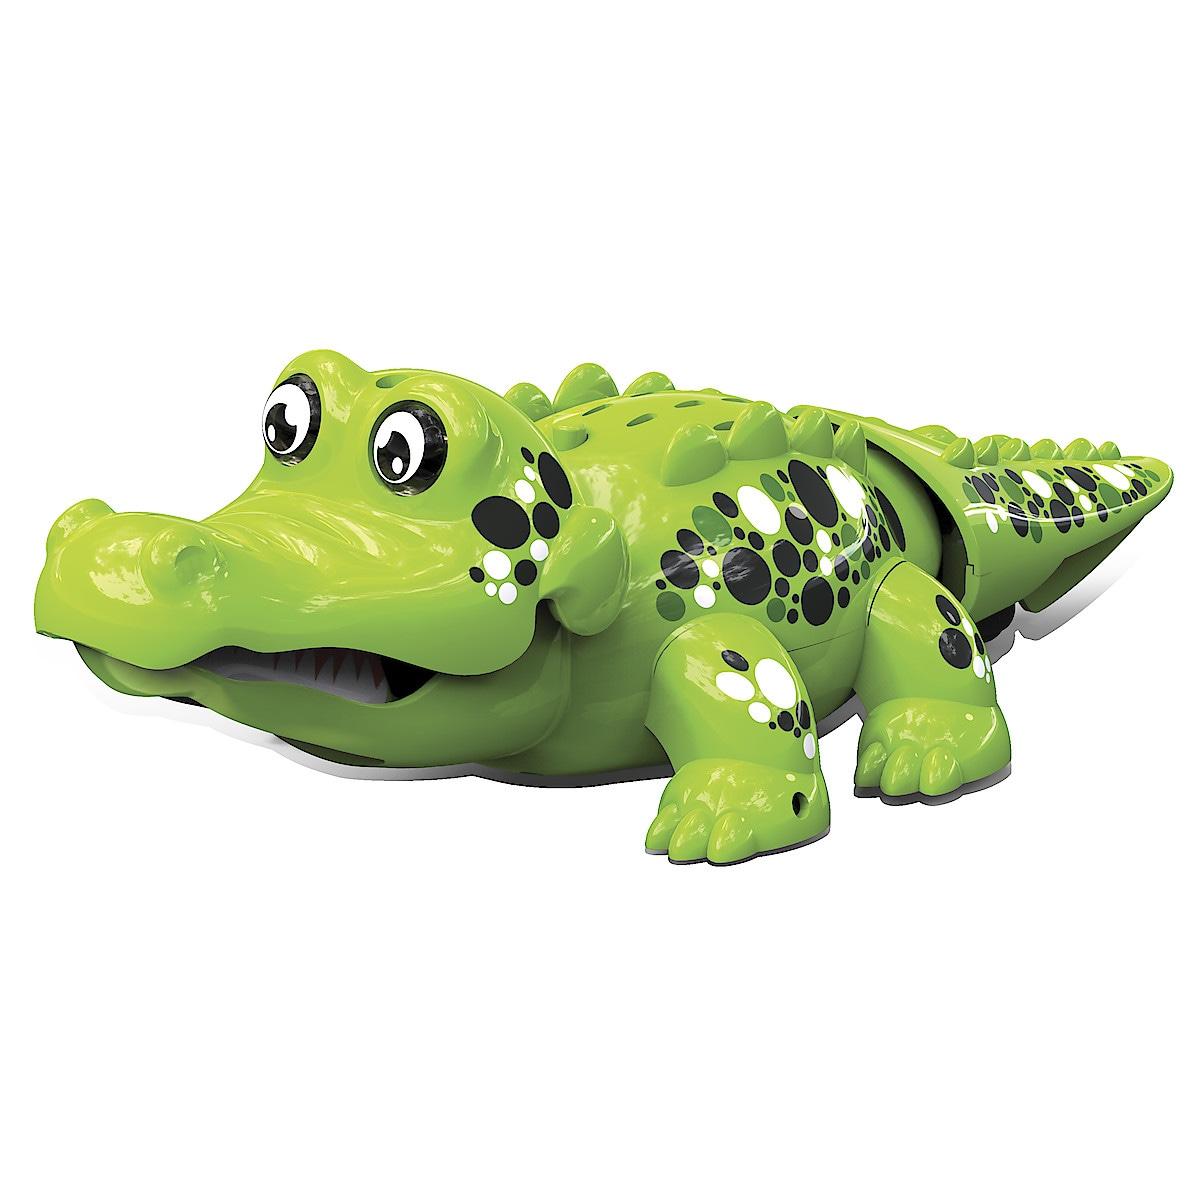 Silverlit Aqua Crocos, svømmende krokodille